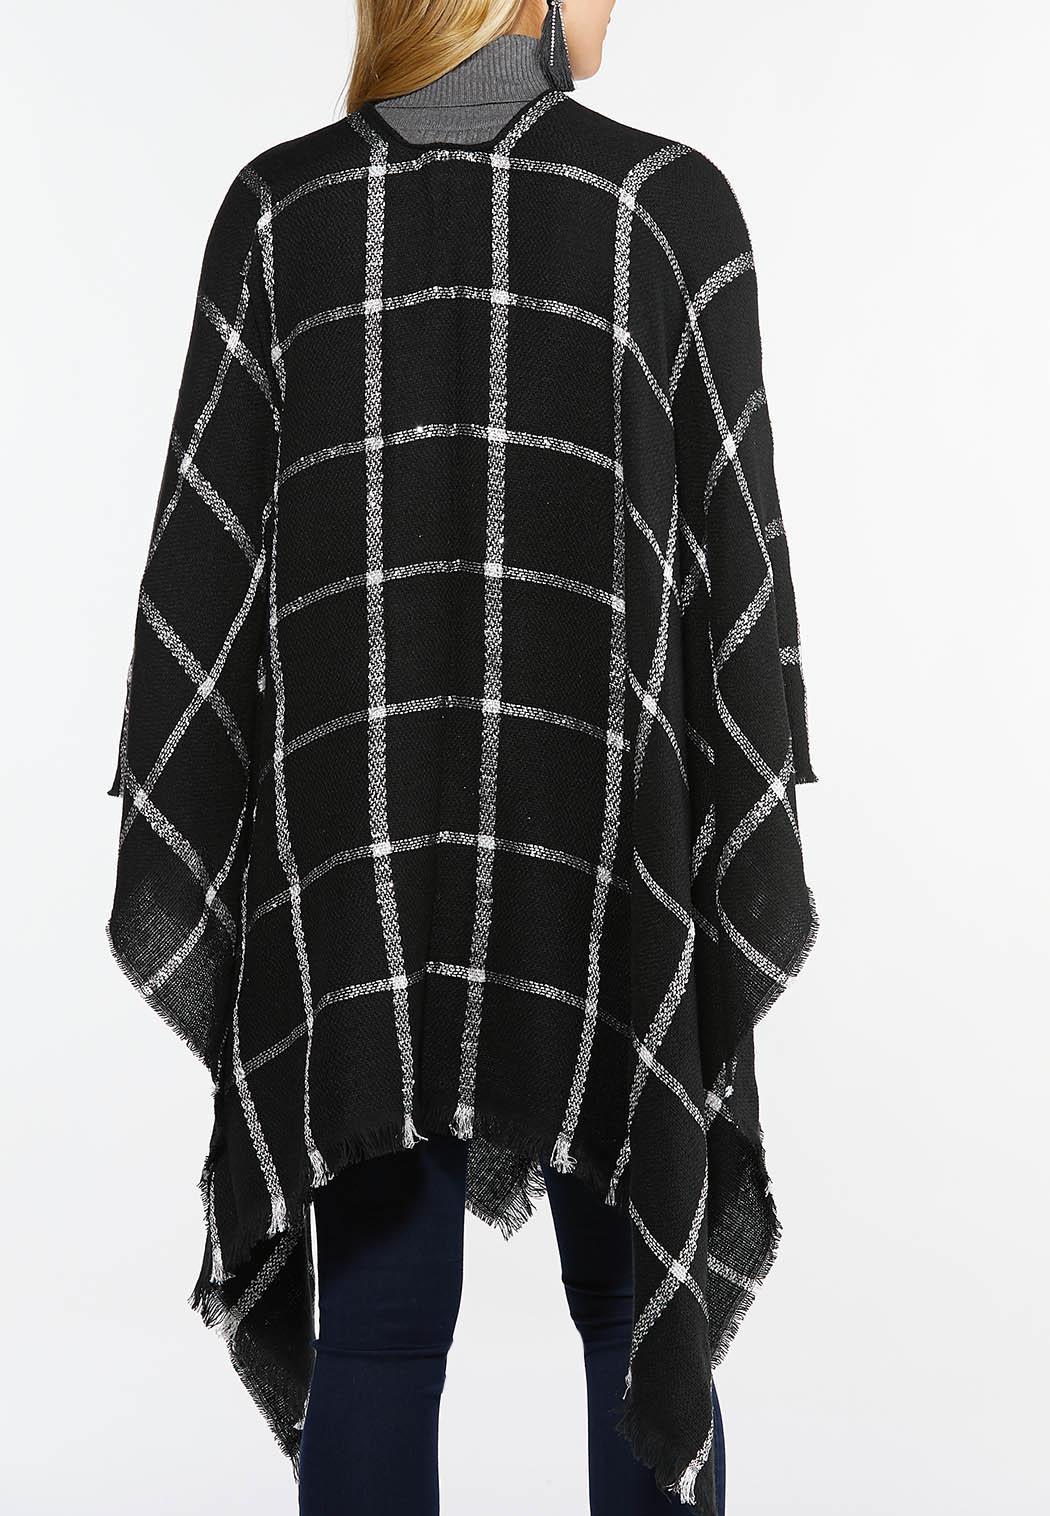 Sequin Checkered Wrap (Item #44407109)